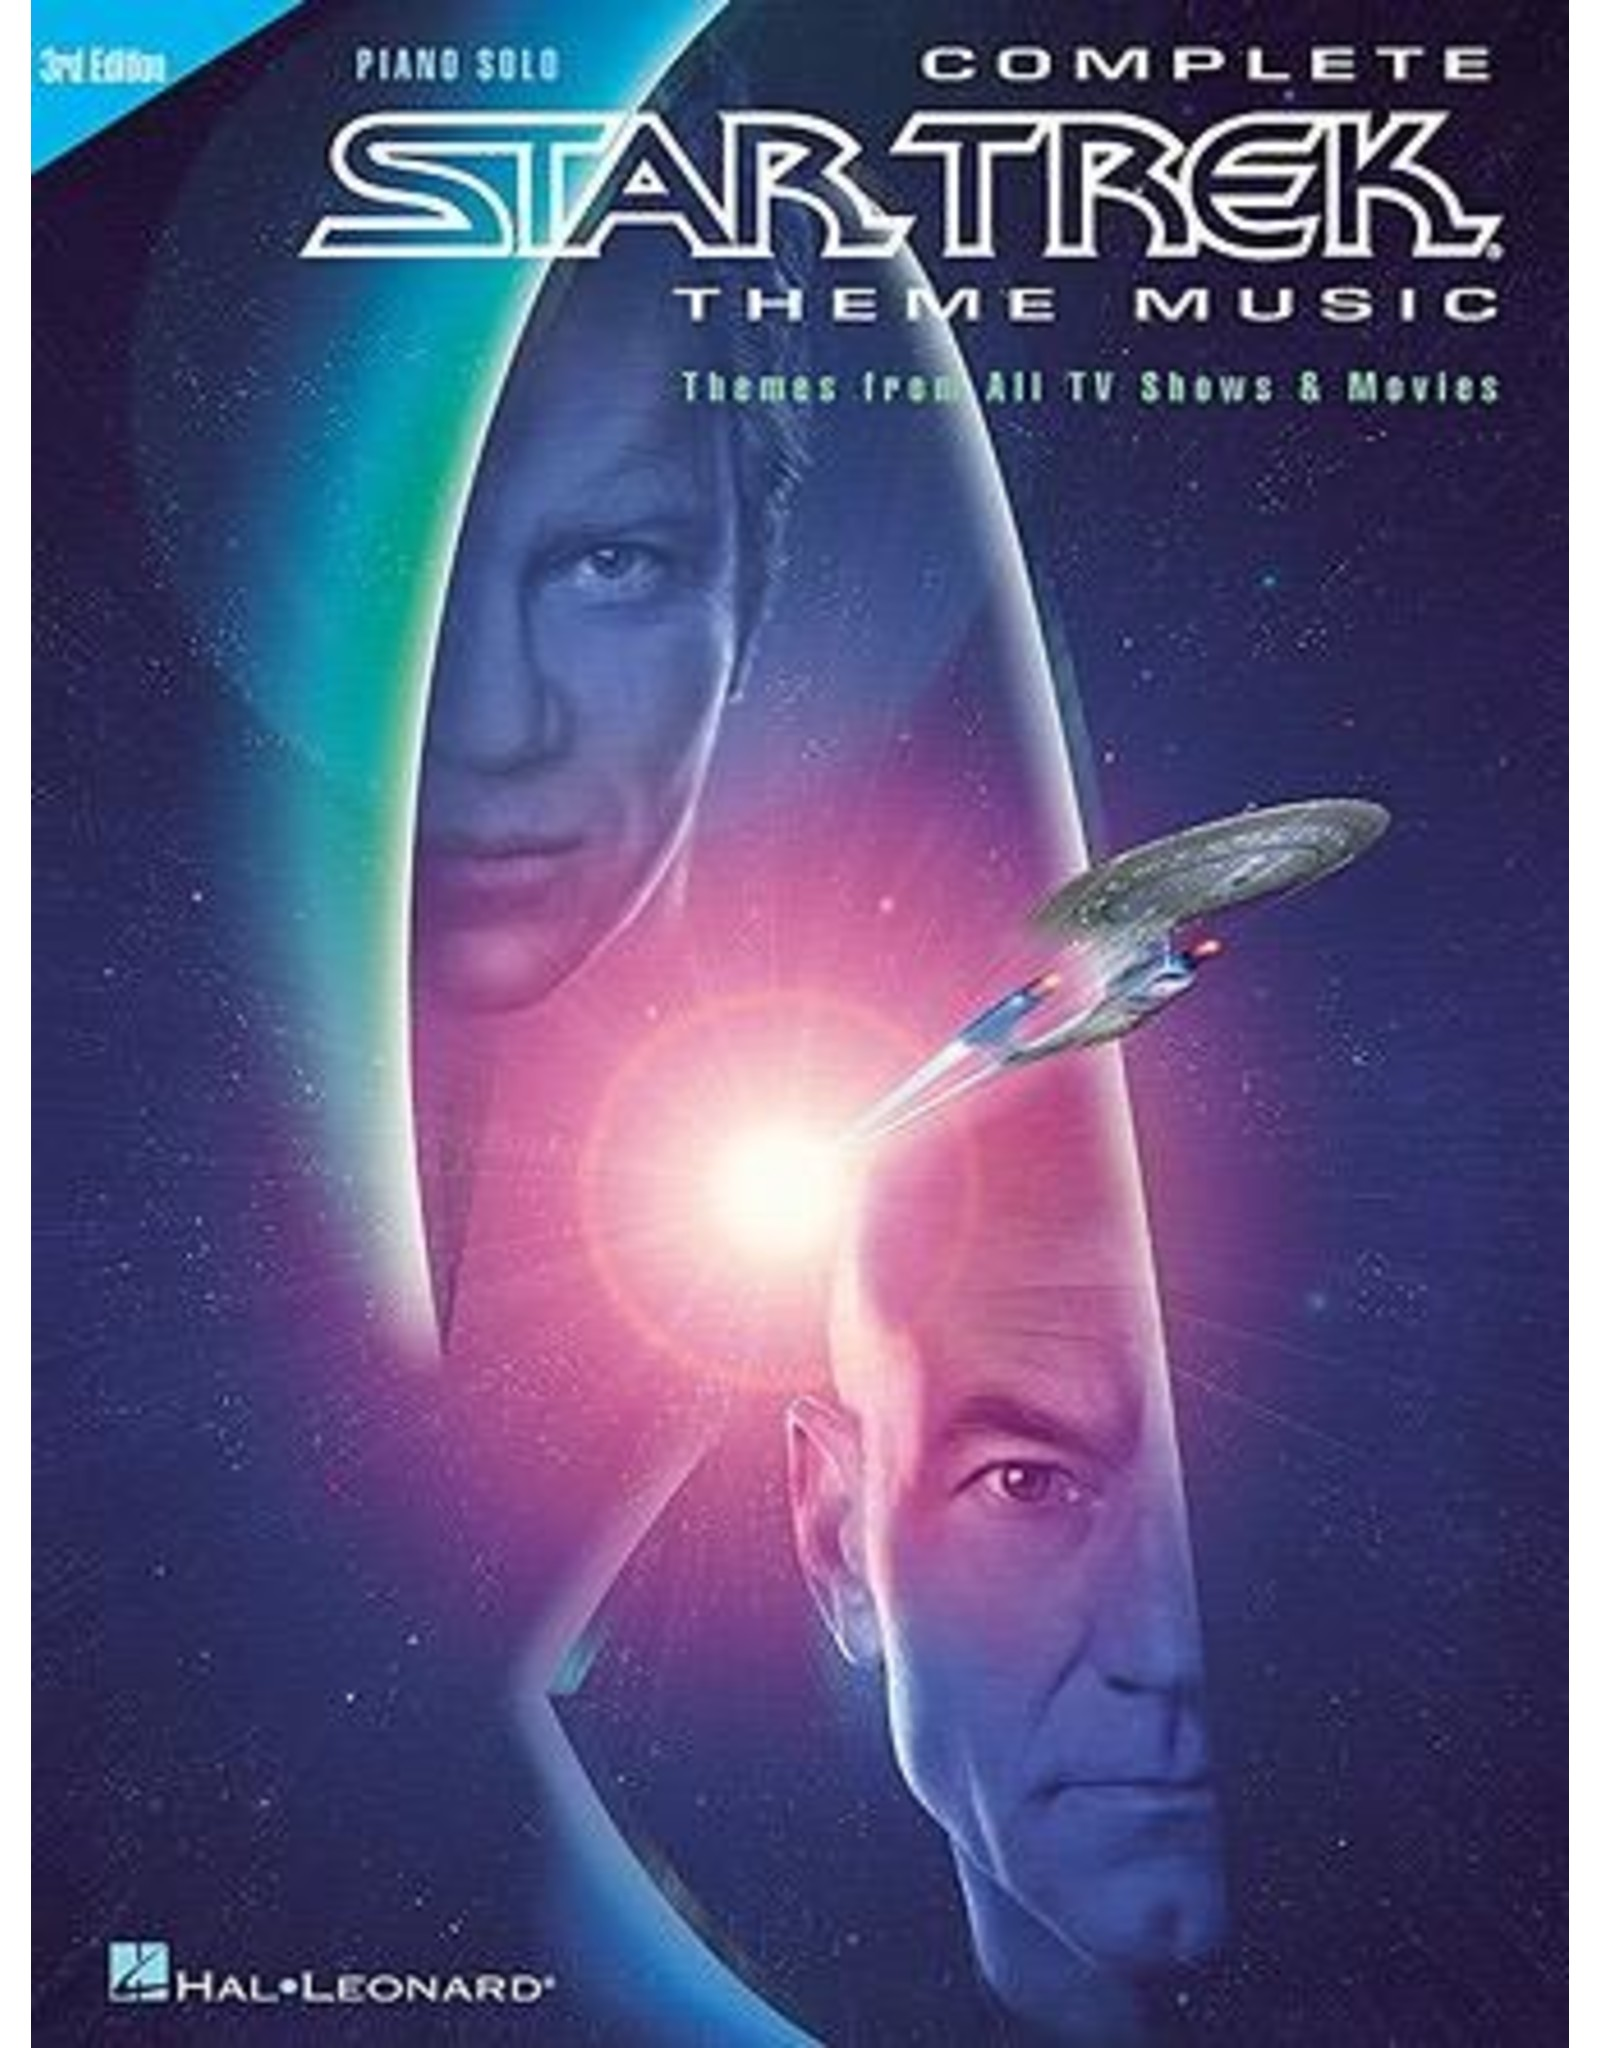 Hal Leonard Star Trek Complete Theme Music Piano Solo